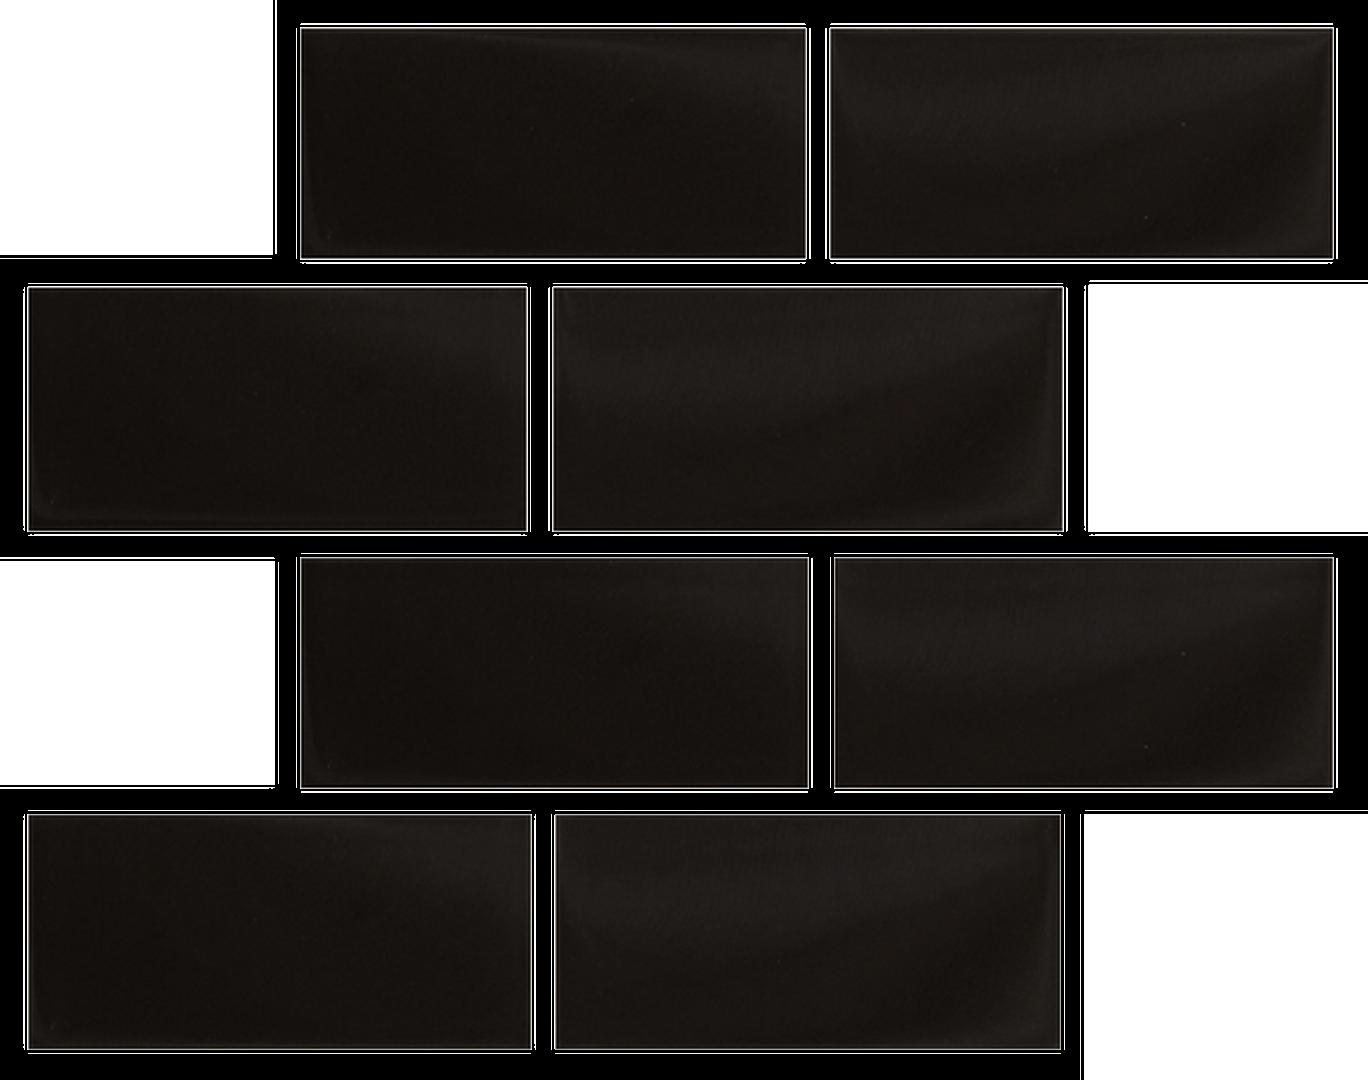 Crystal 3 x 6 Subway Tiles Black